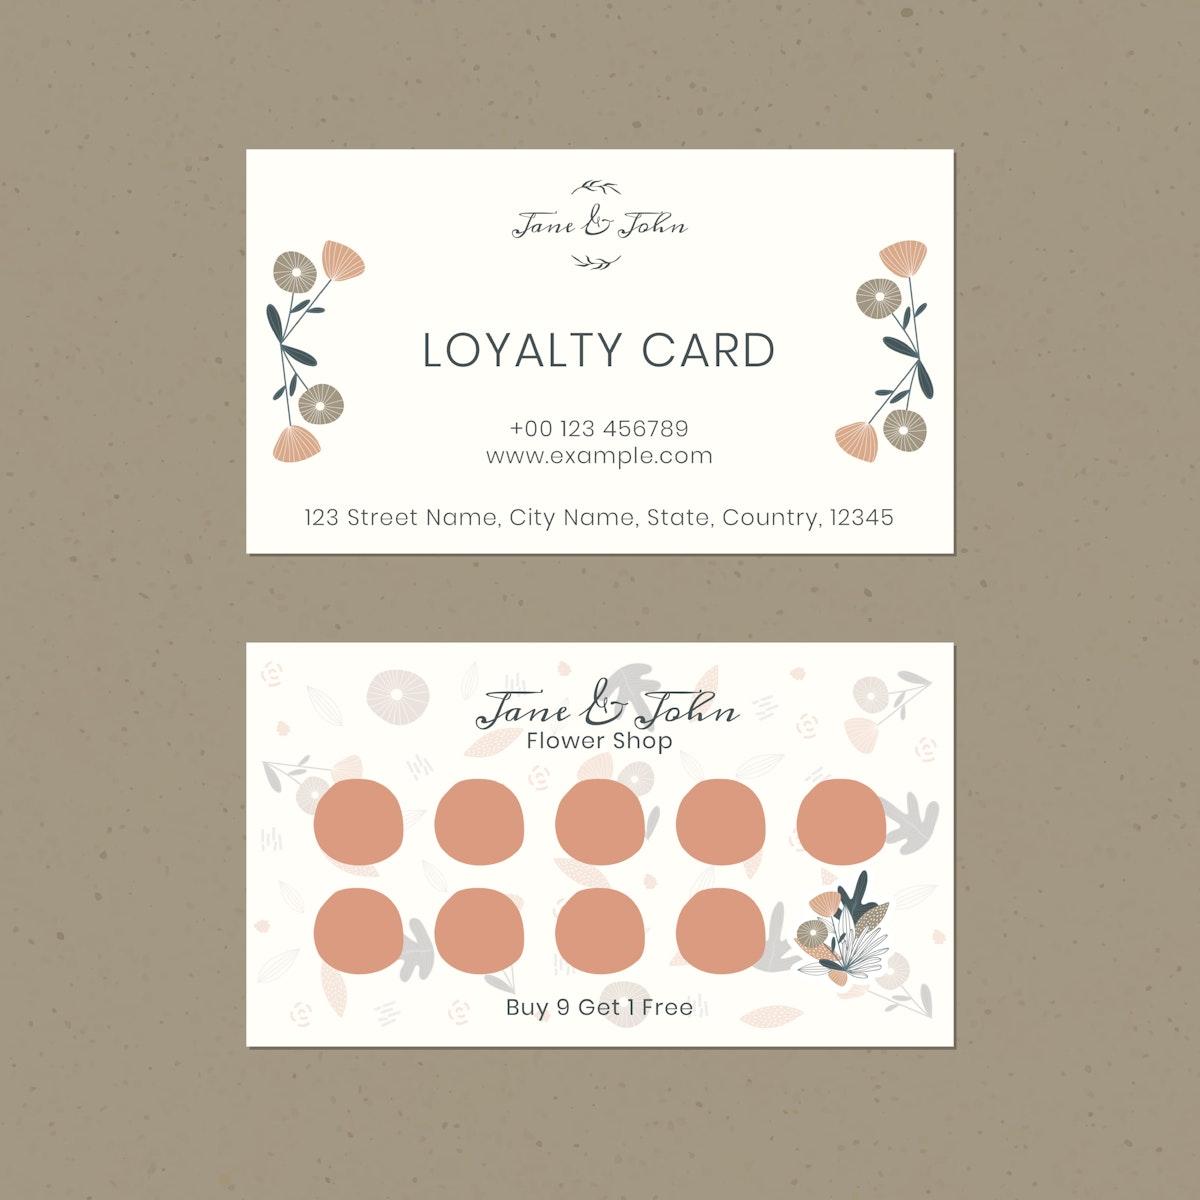 Floral loyalty card design vector